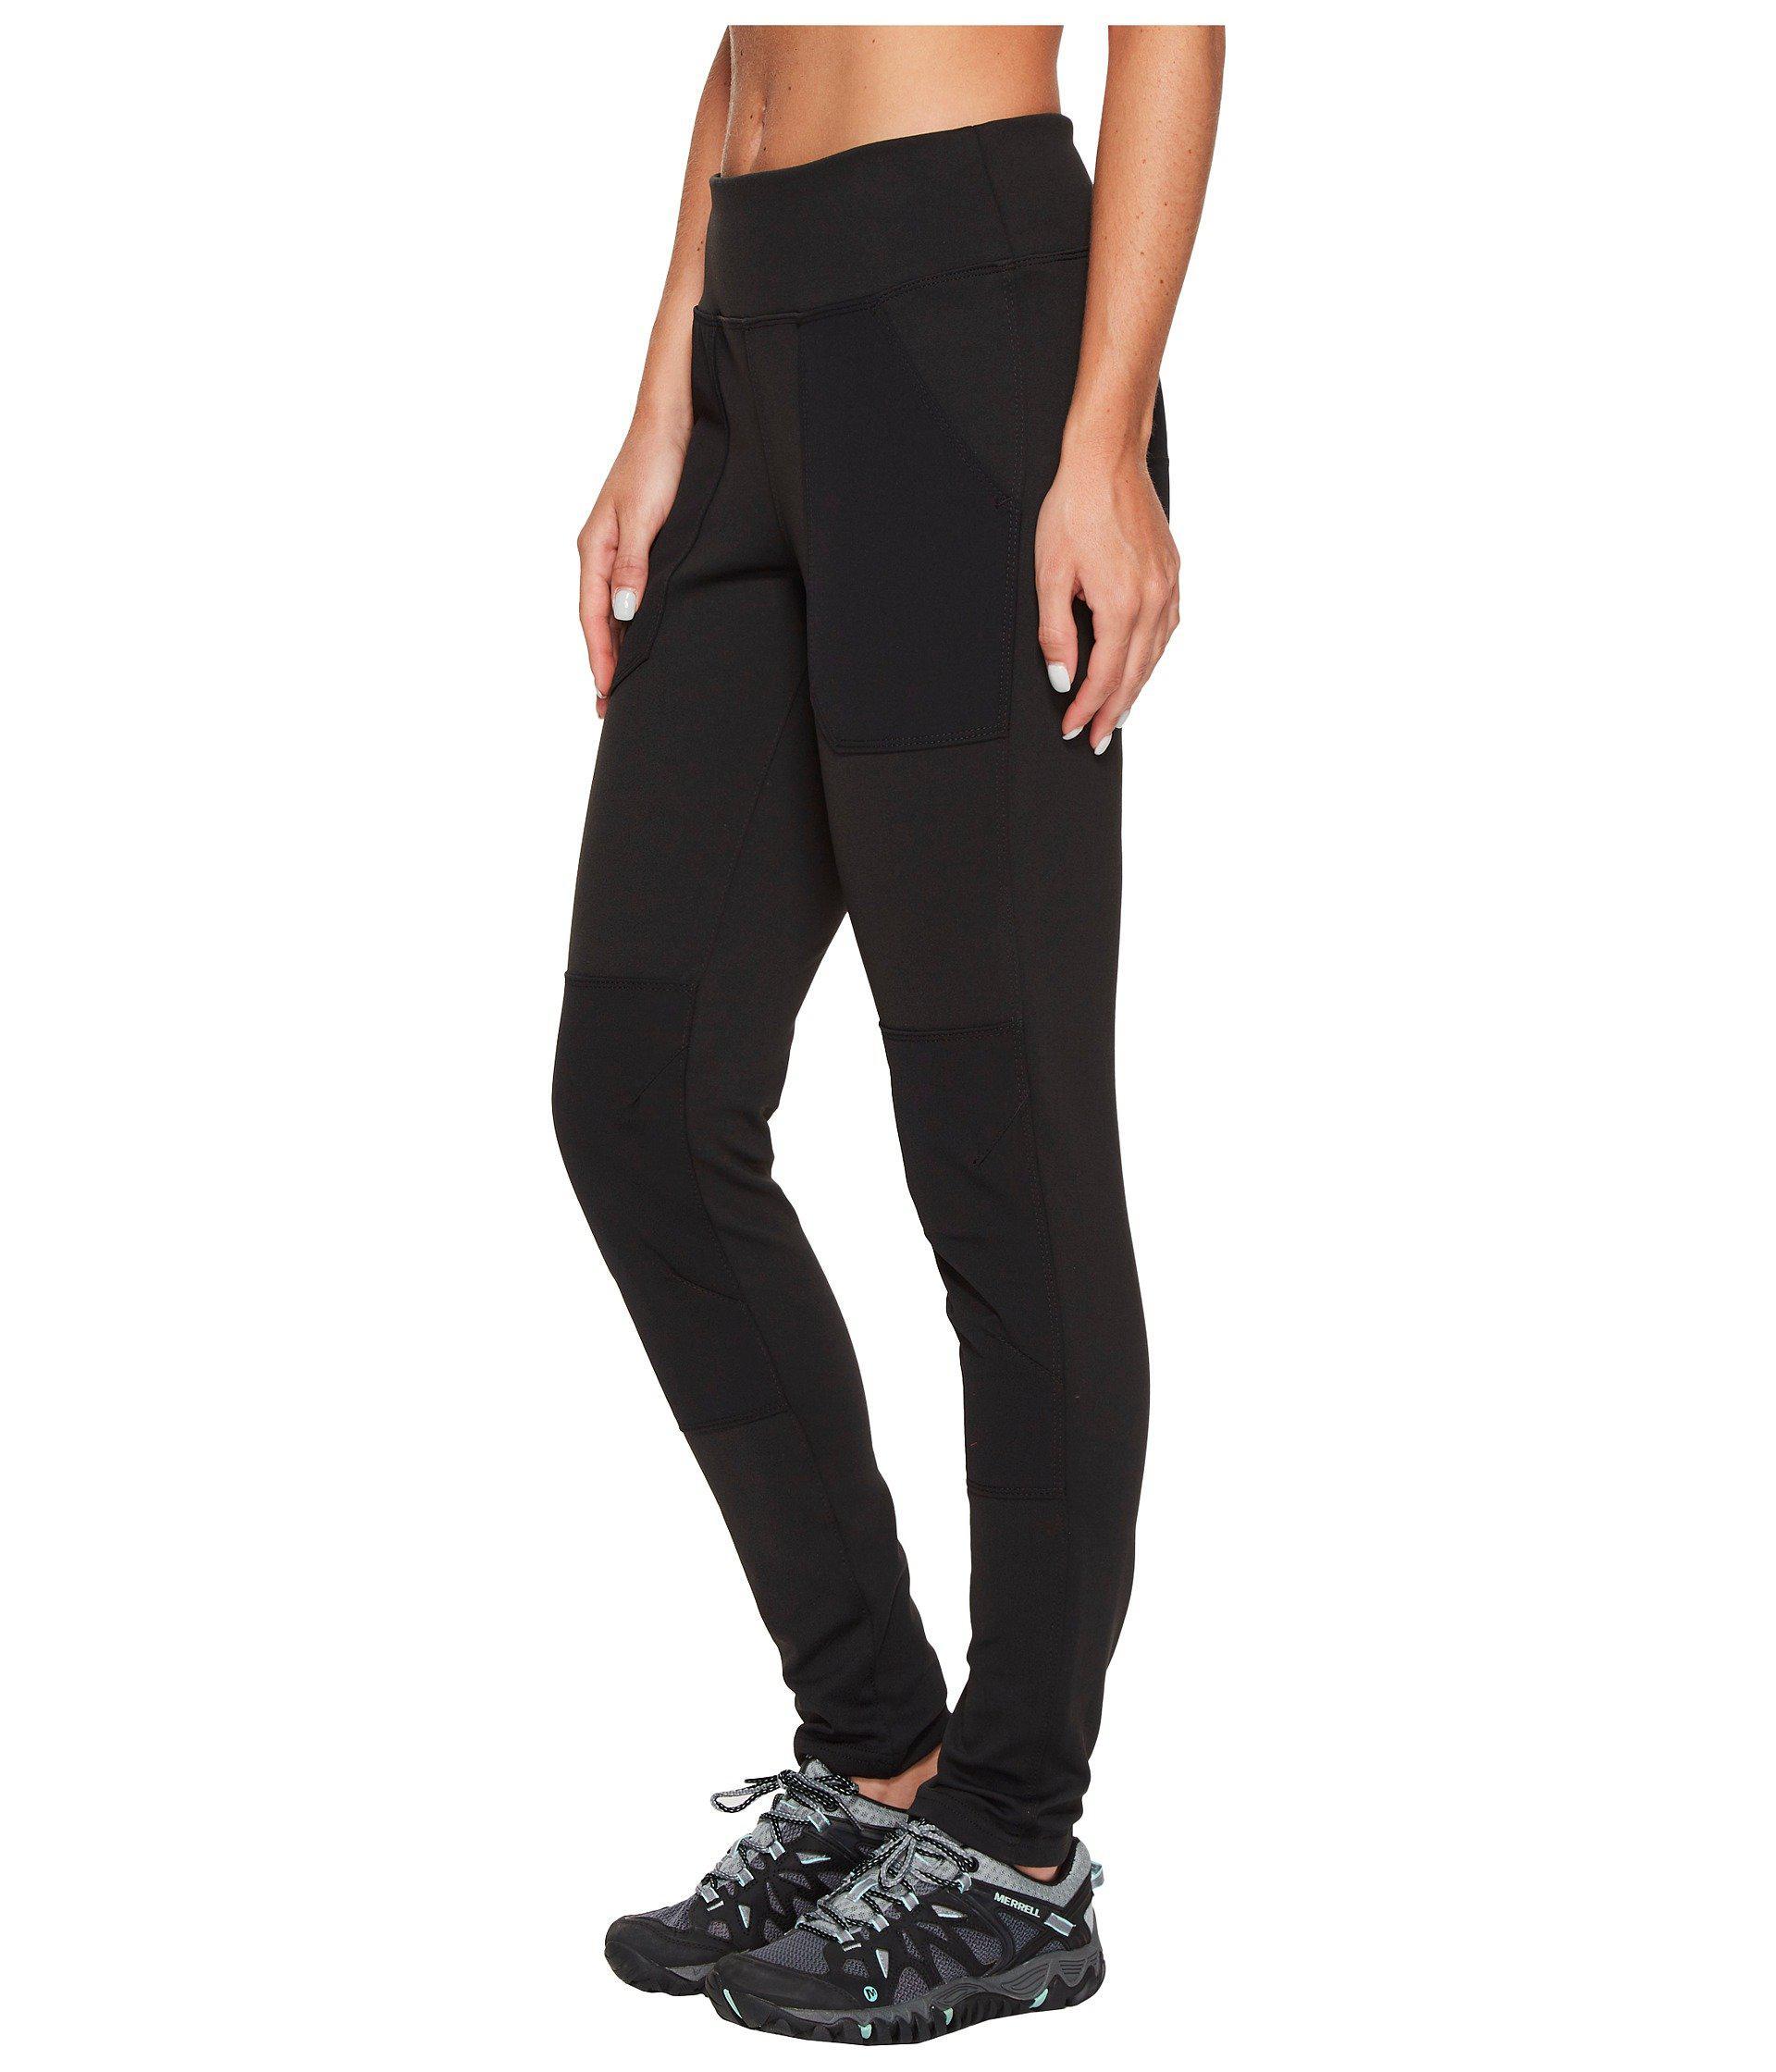 71f9d27d01606 Carhartt Force Utility Knit Pants (black) Women's Casual Pants in ...